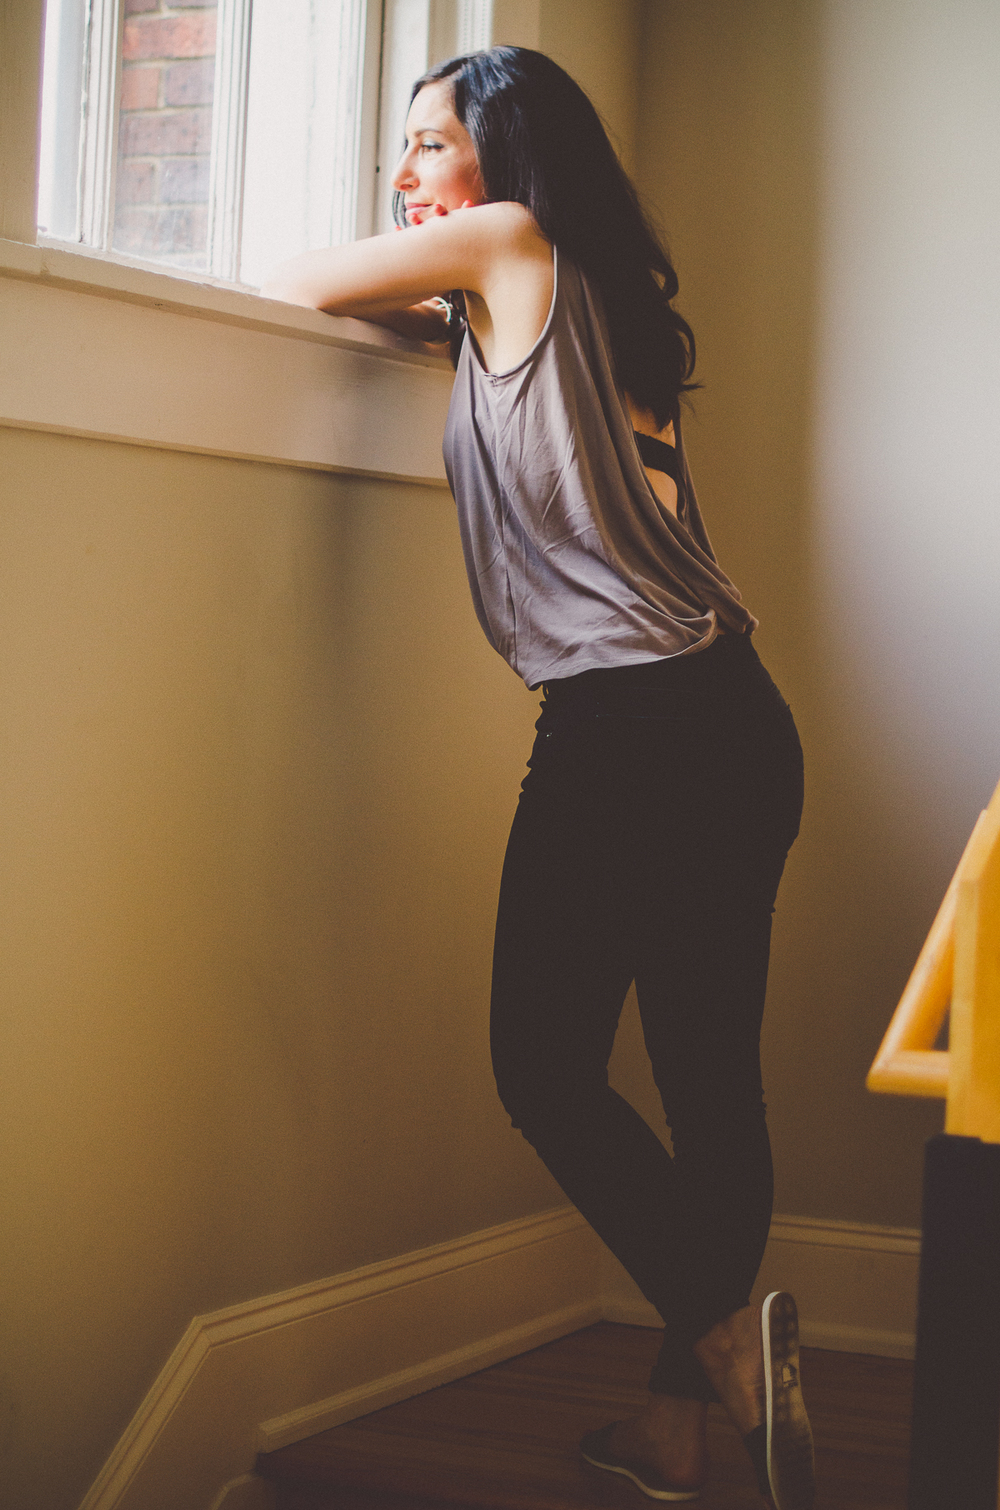 melanie-kelley-raye-atlanta-lifestyle-photographer-7.jpg